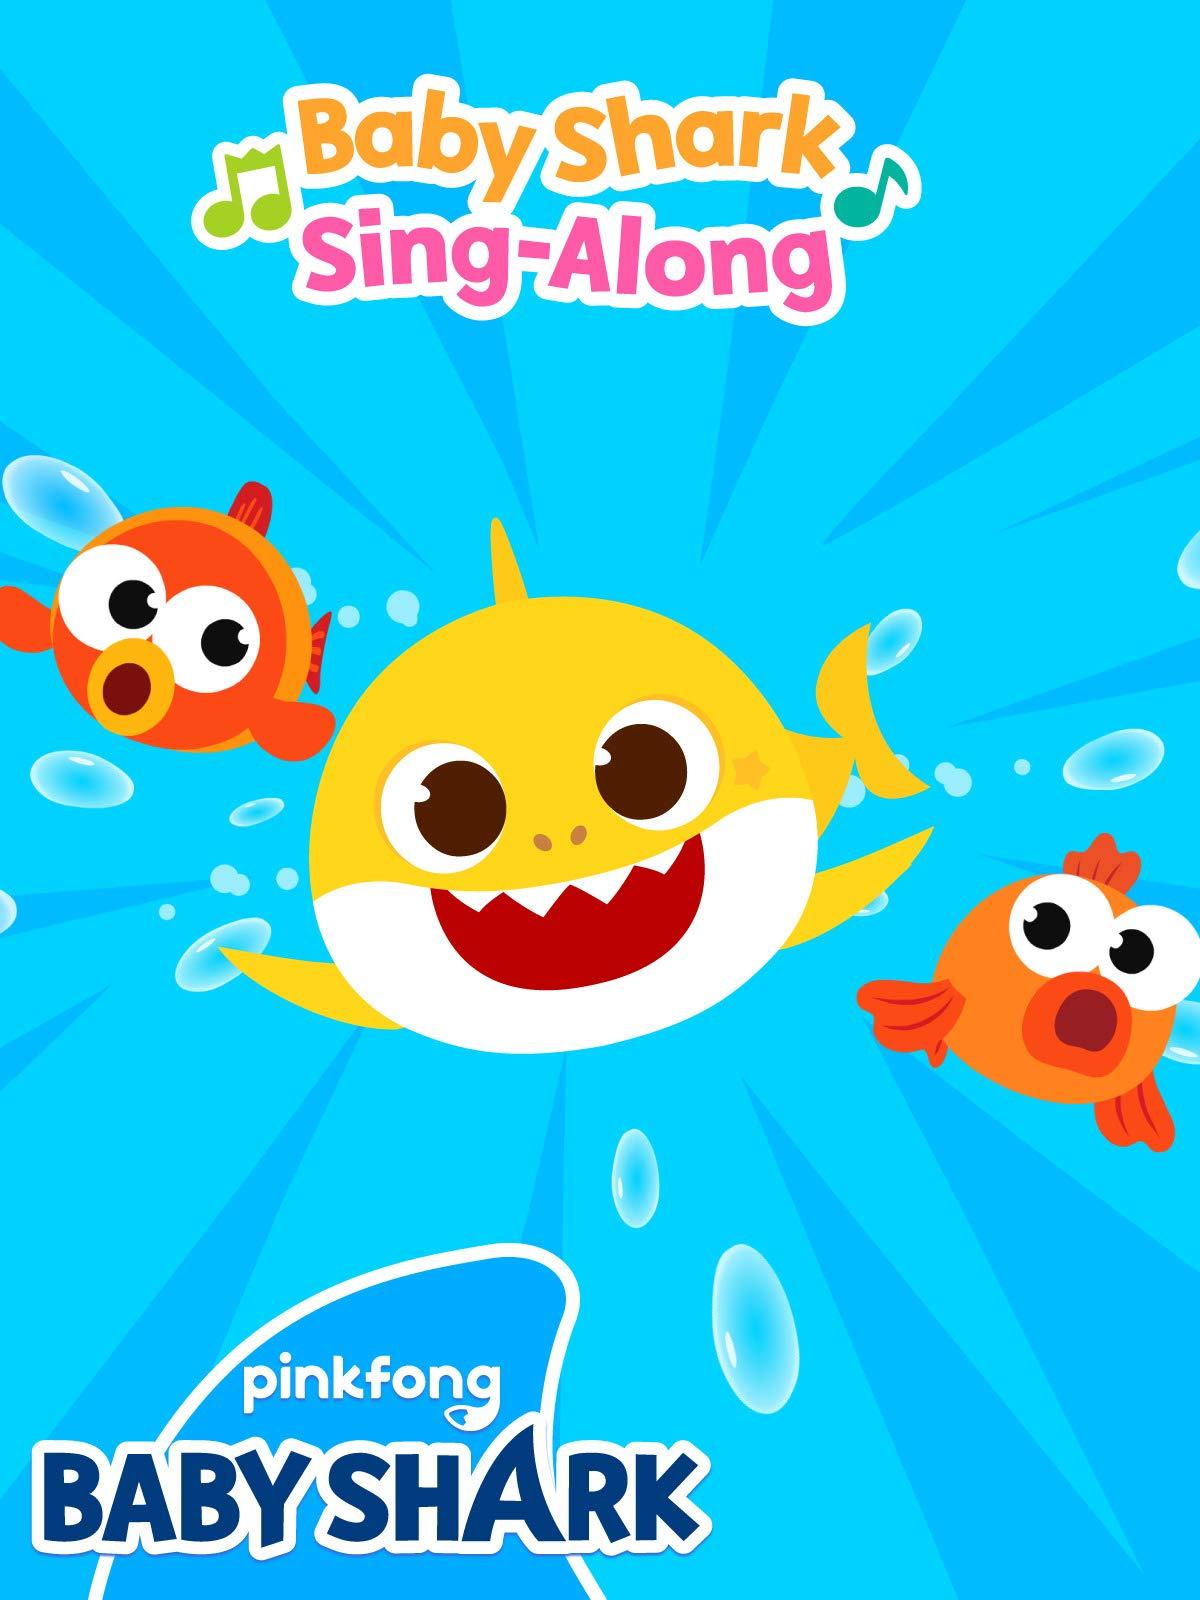 Pinkfong! Baby Shark Sing-Along